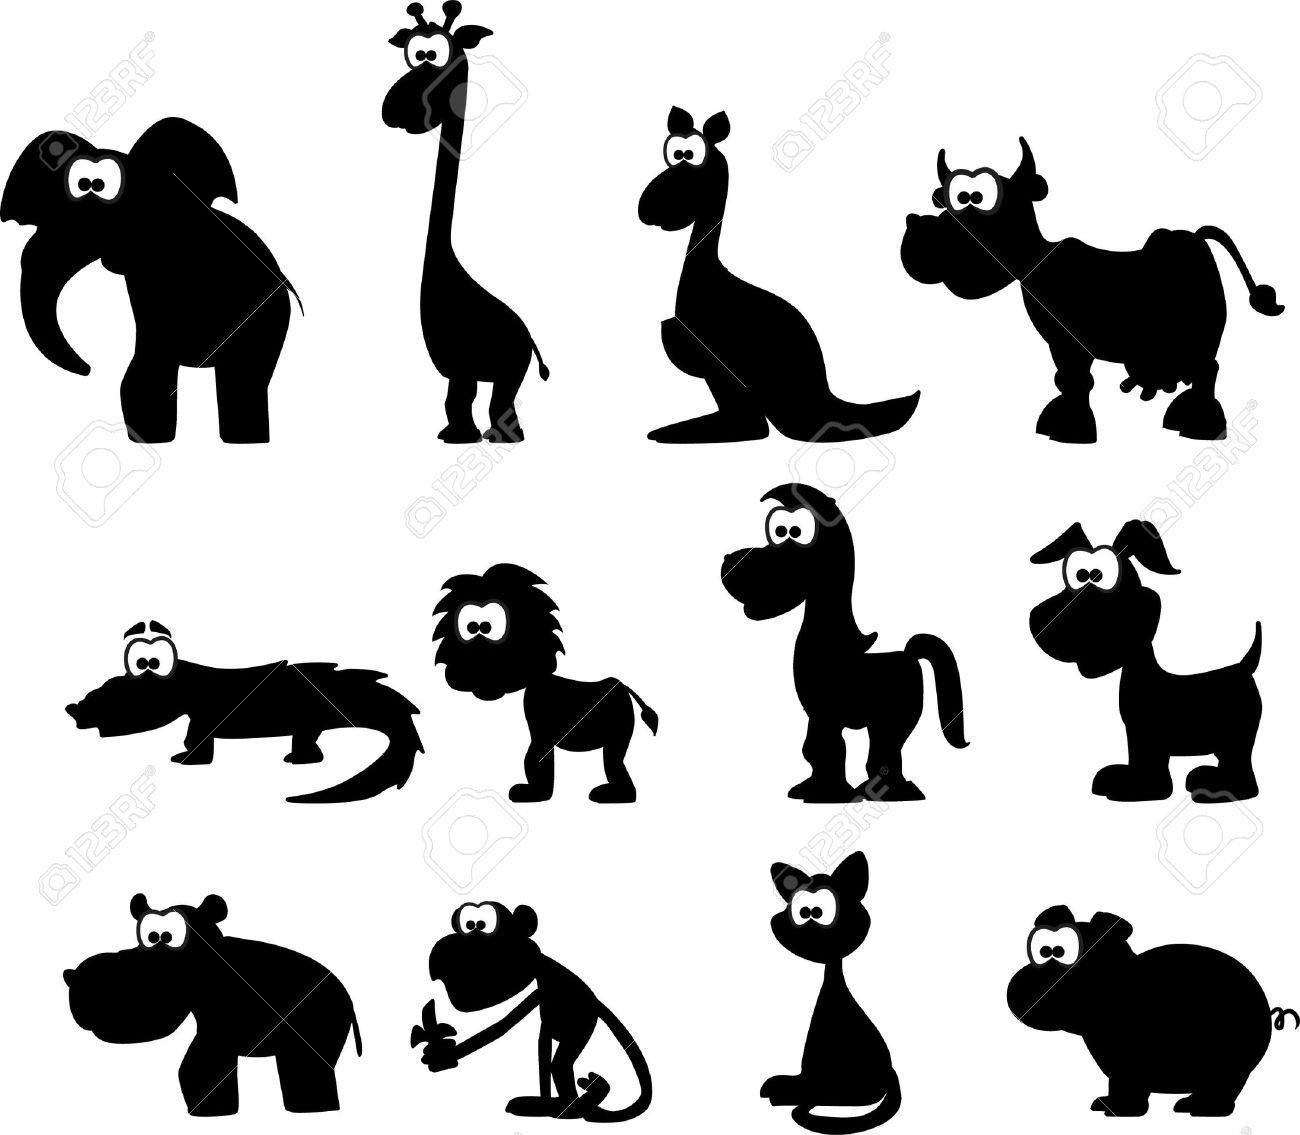 Cartoon Silhouettes Of Animals Cartoon Silhouette Animal Silhouette Silhouette